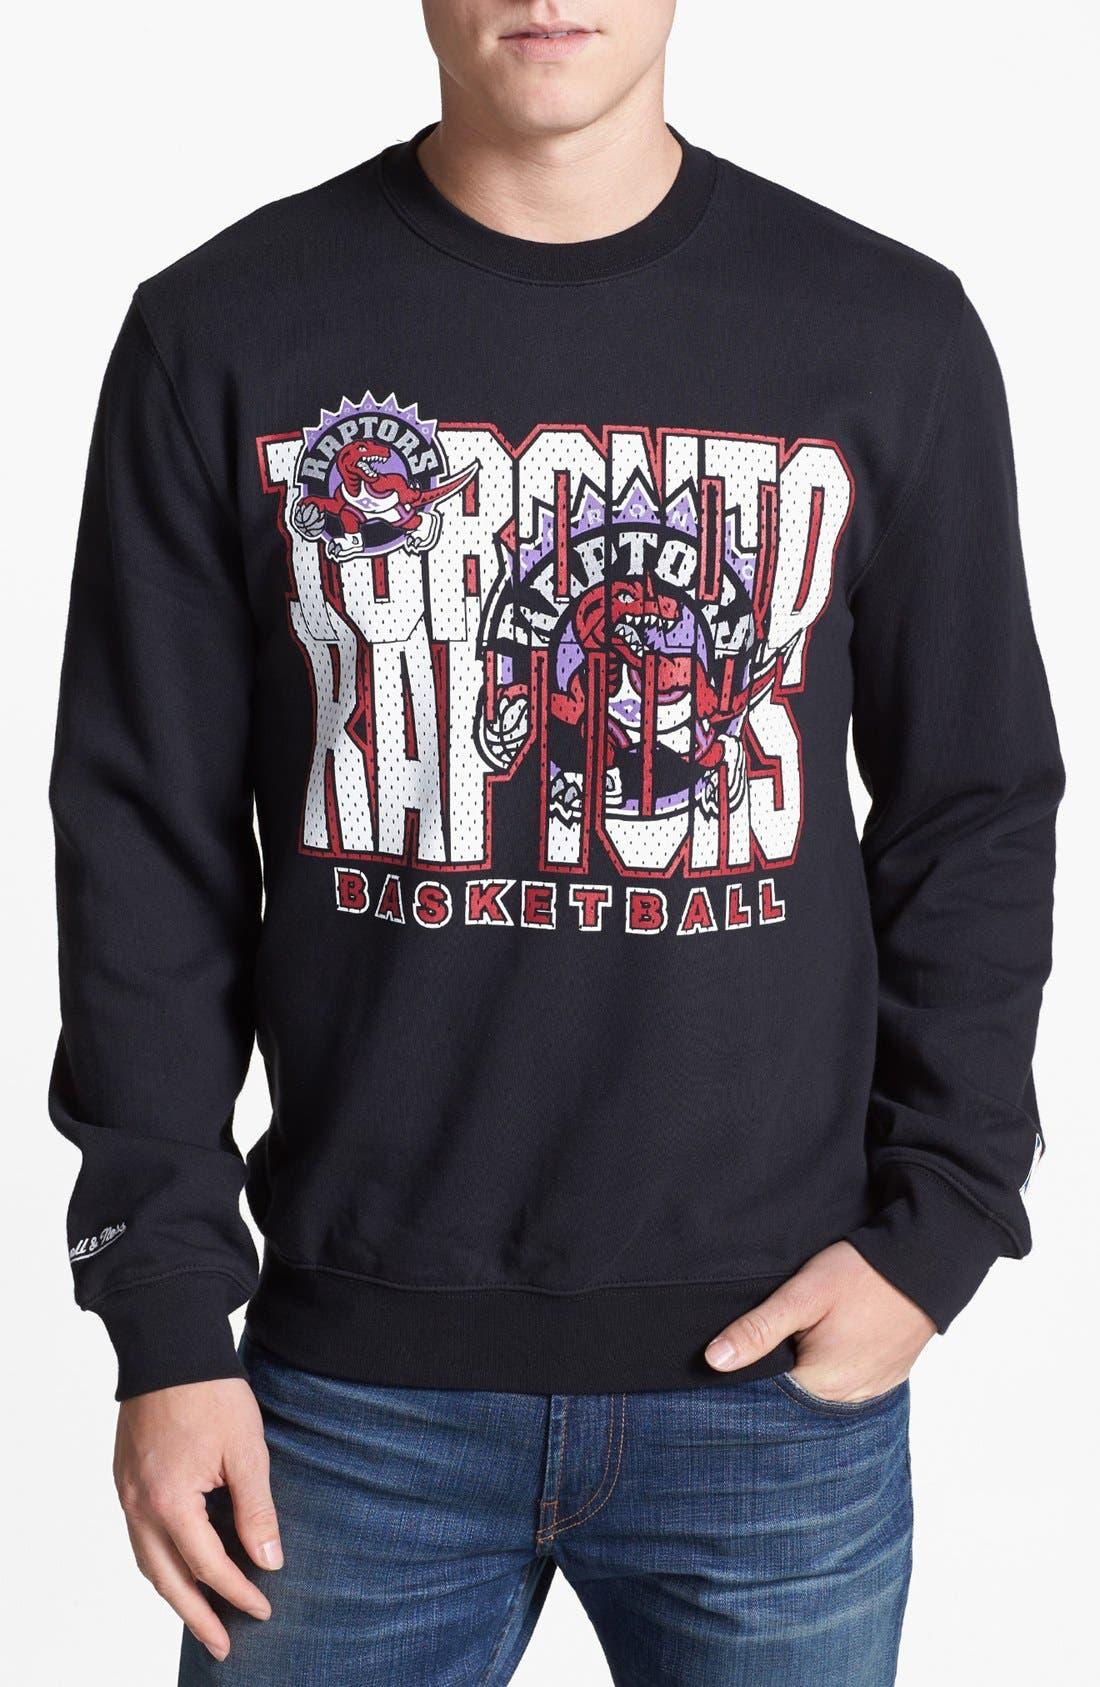 Alternate Image 1 Selected - Mitchell & Ness 'Toronto Raptors' Sweatshirt